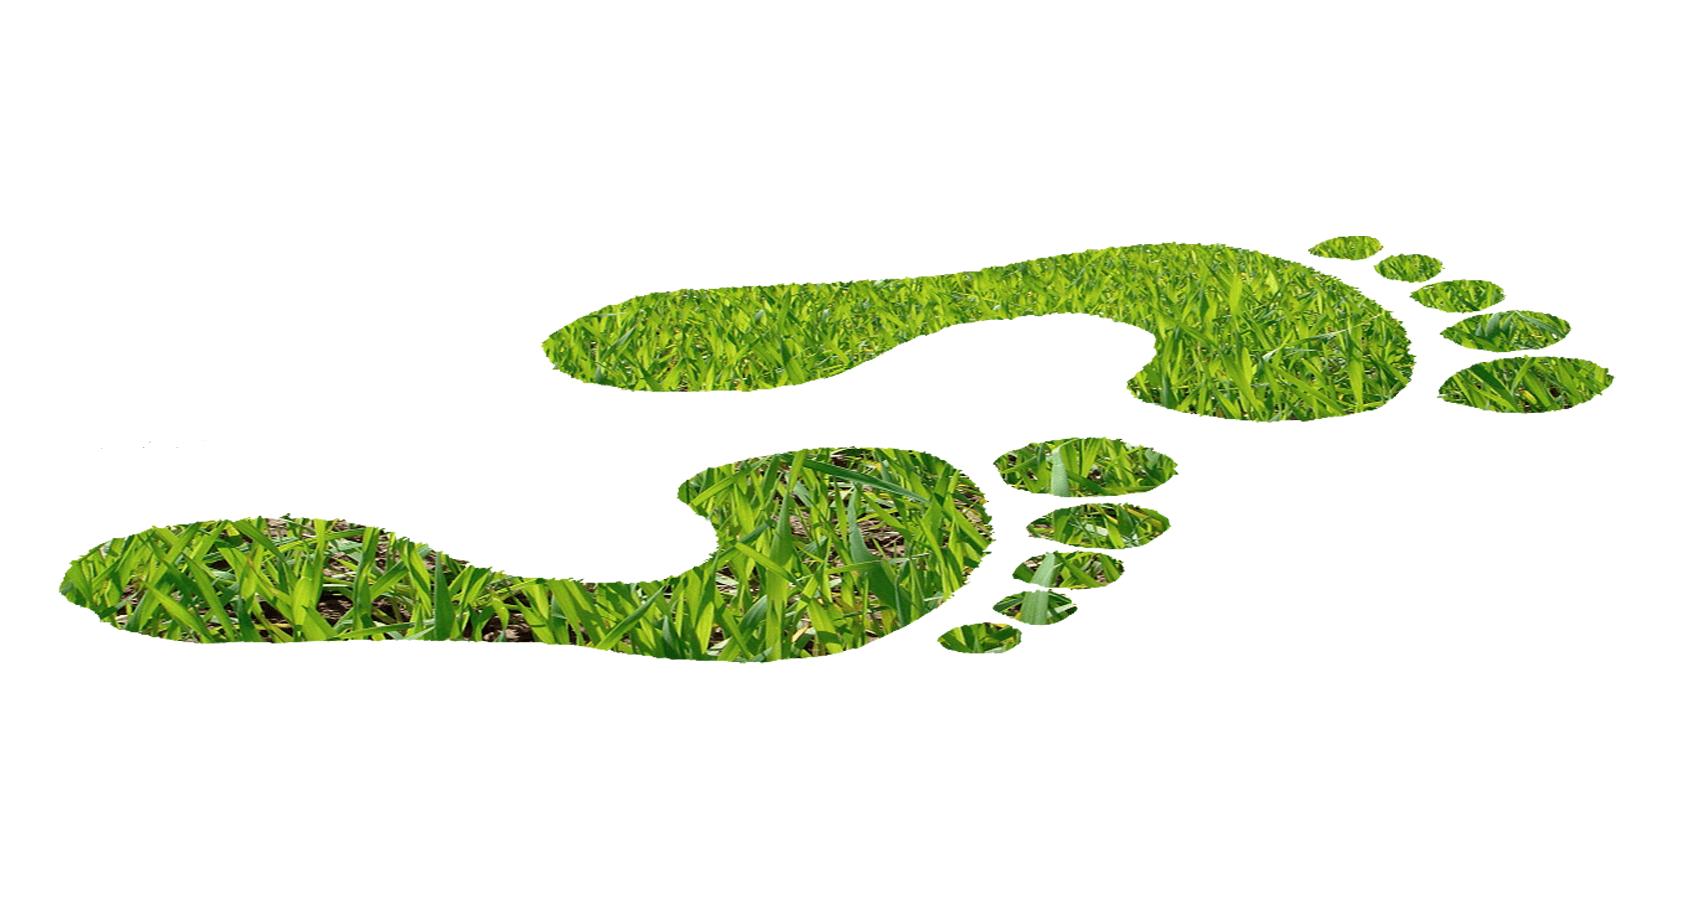 plastics greenhouse gasses reduction